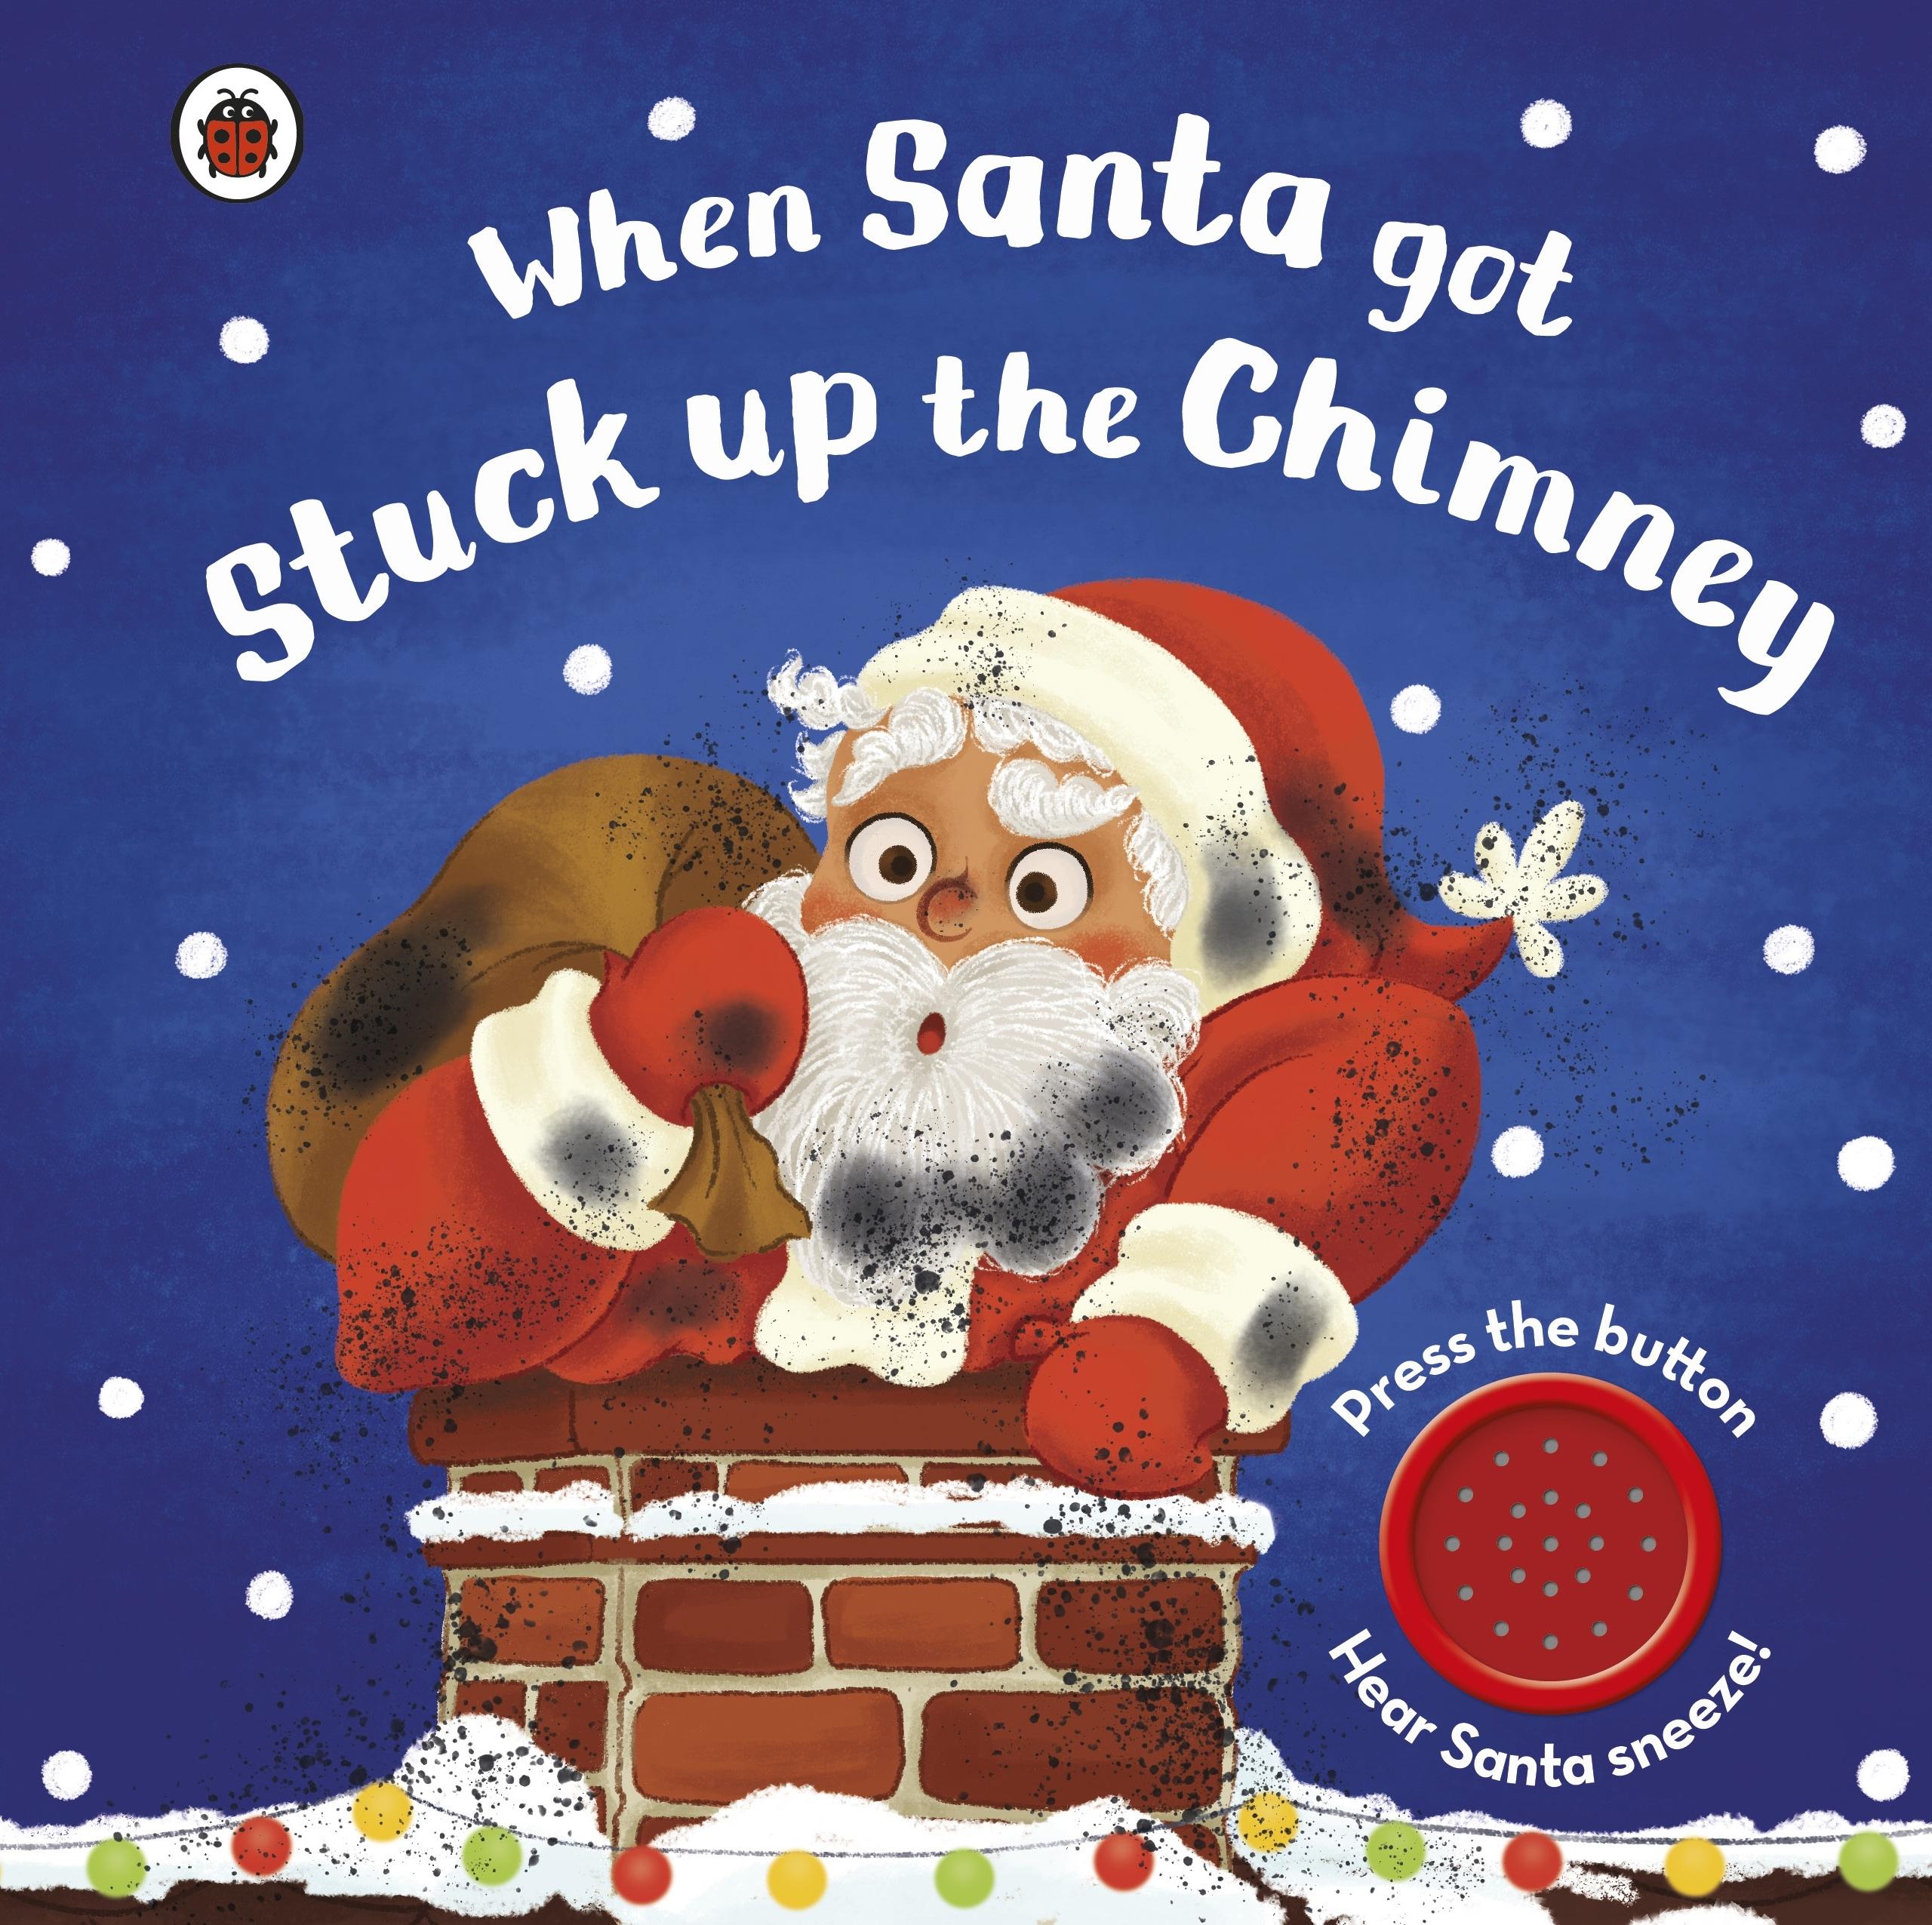 When Is Christmas In Australia.When Santa Got Stuck Up The Chimney Penguin Books Australia